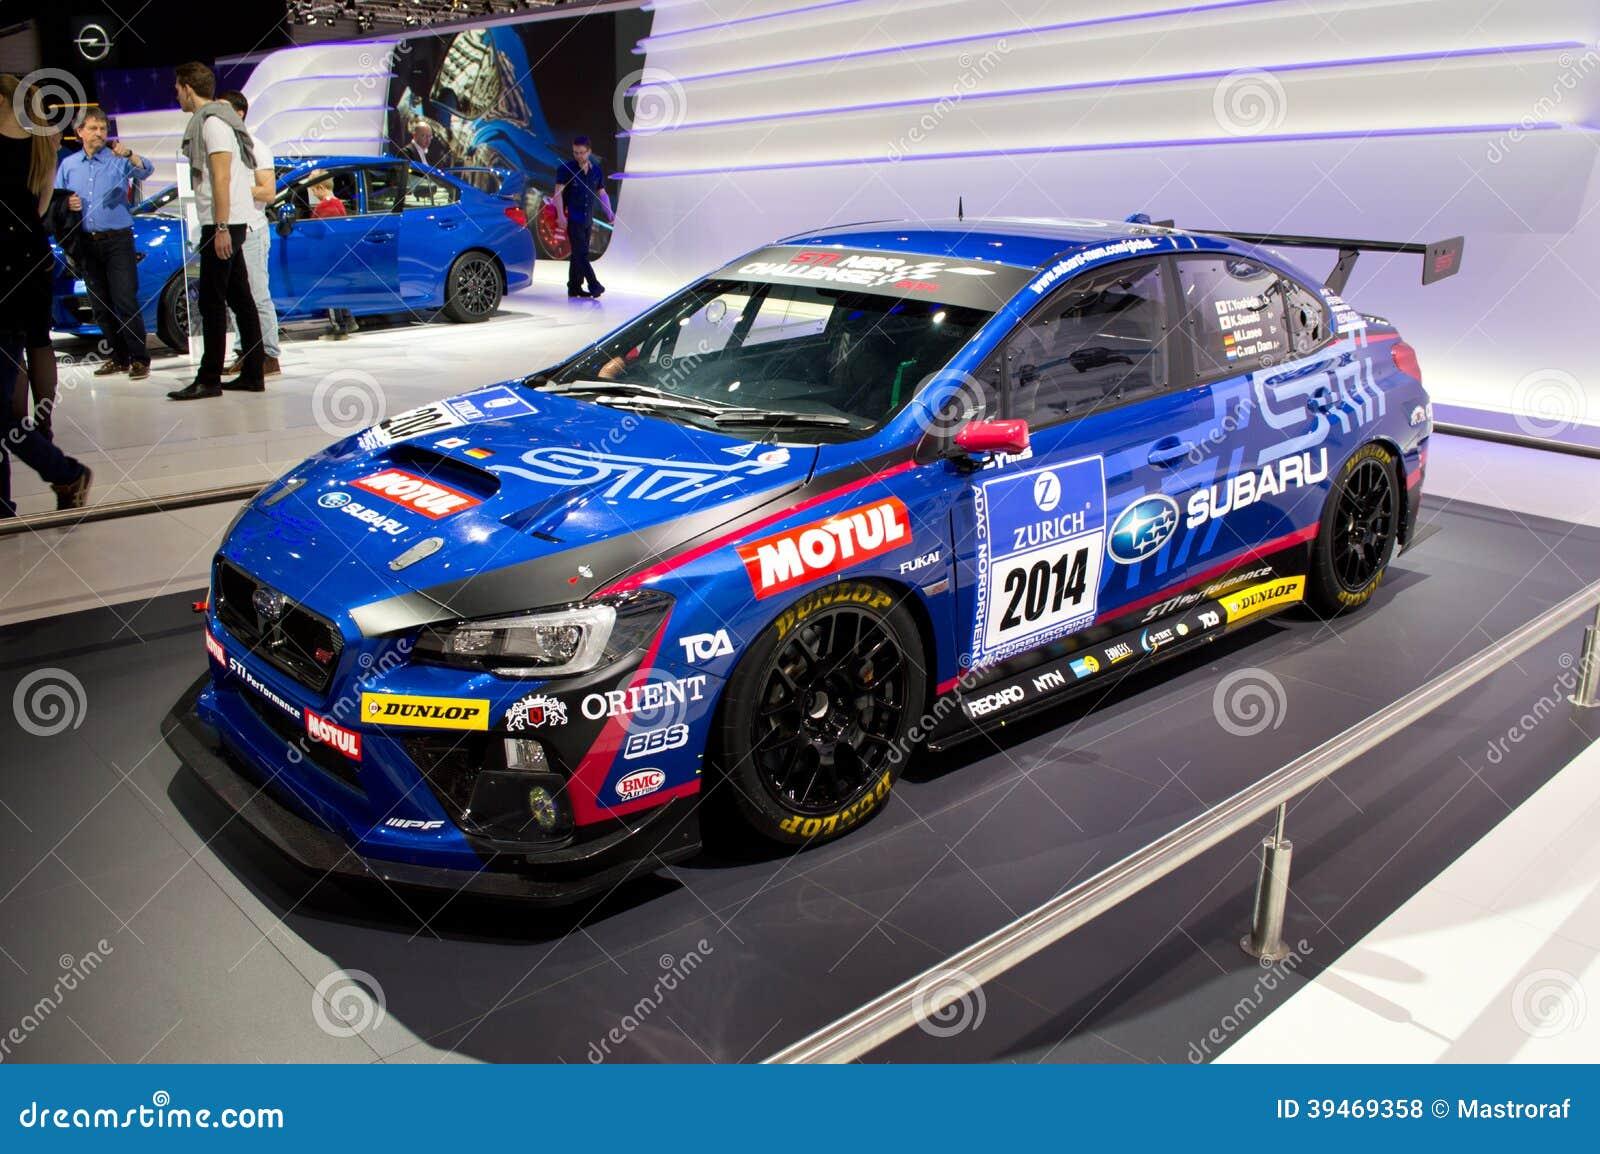 subaru wrx race car geneva 2014 editorial stock photo image 39469358. Black Bedroom Furniture Sets. Home Design Ideas